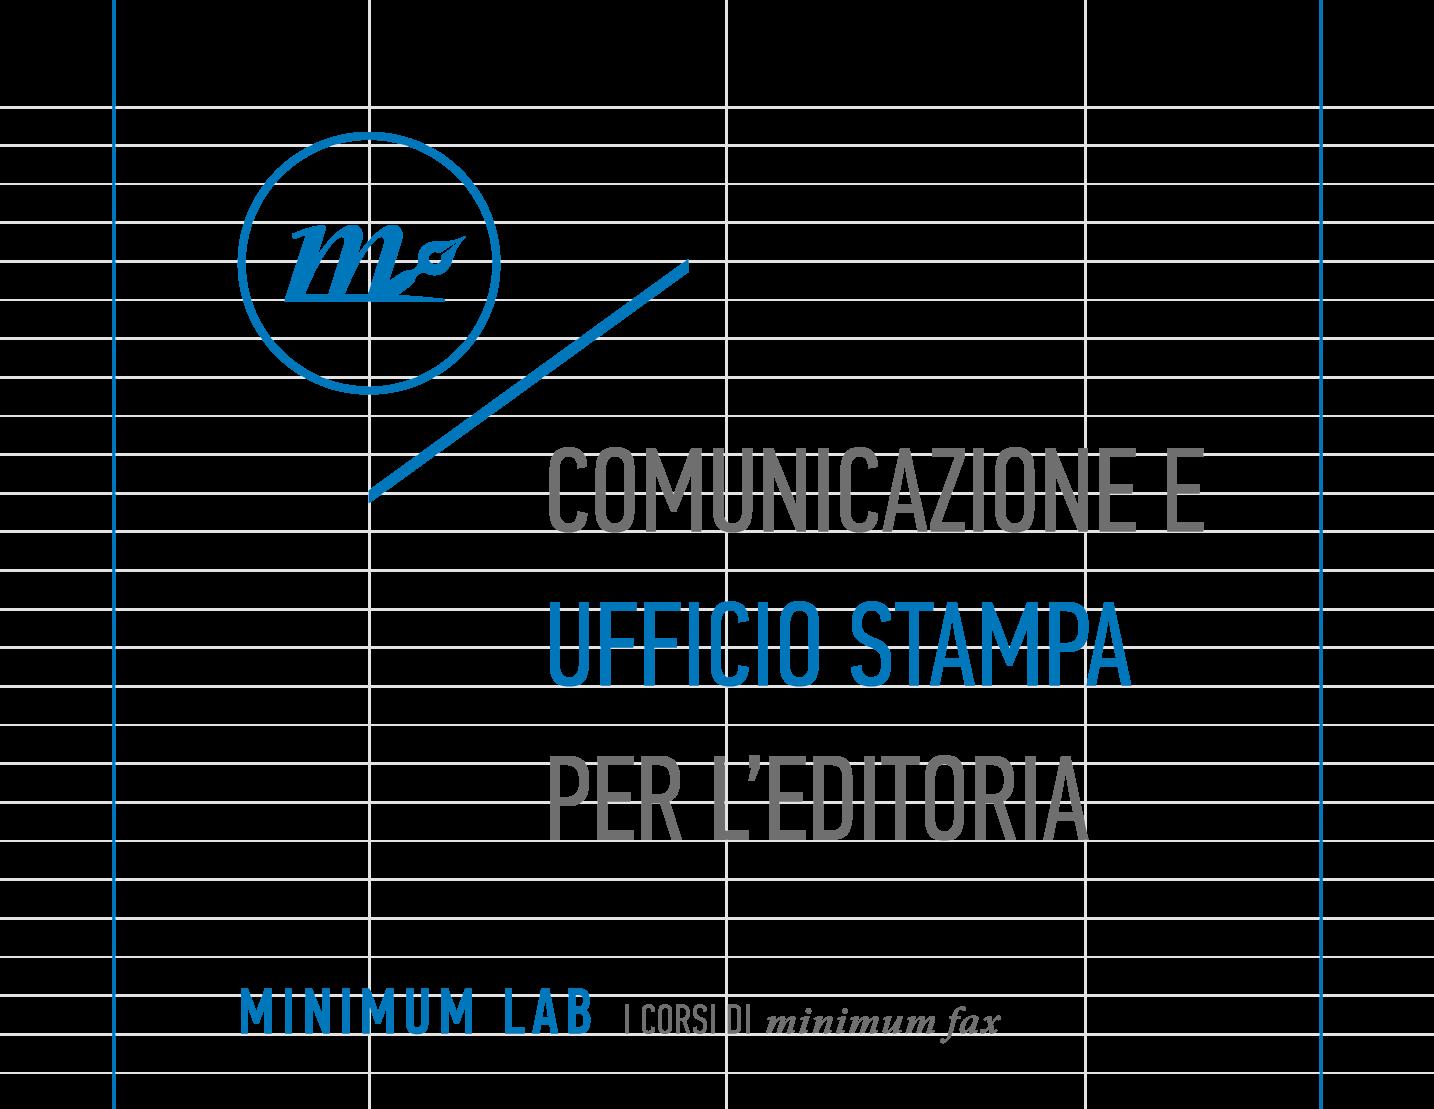 Comunicazione Ufficio Stampa Minimum Lab